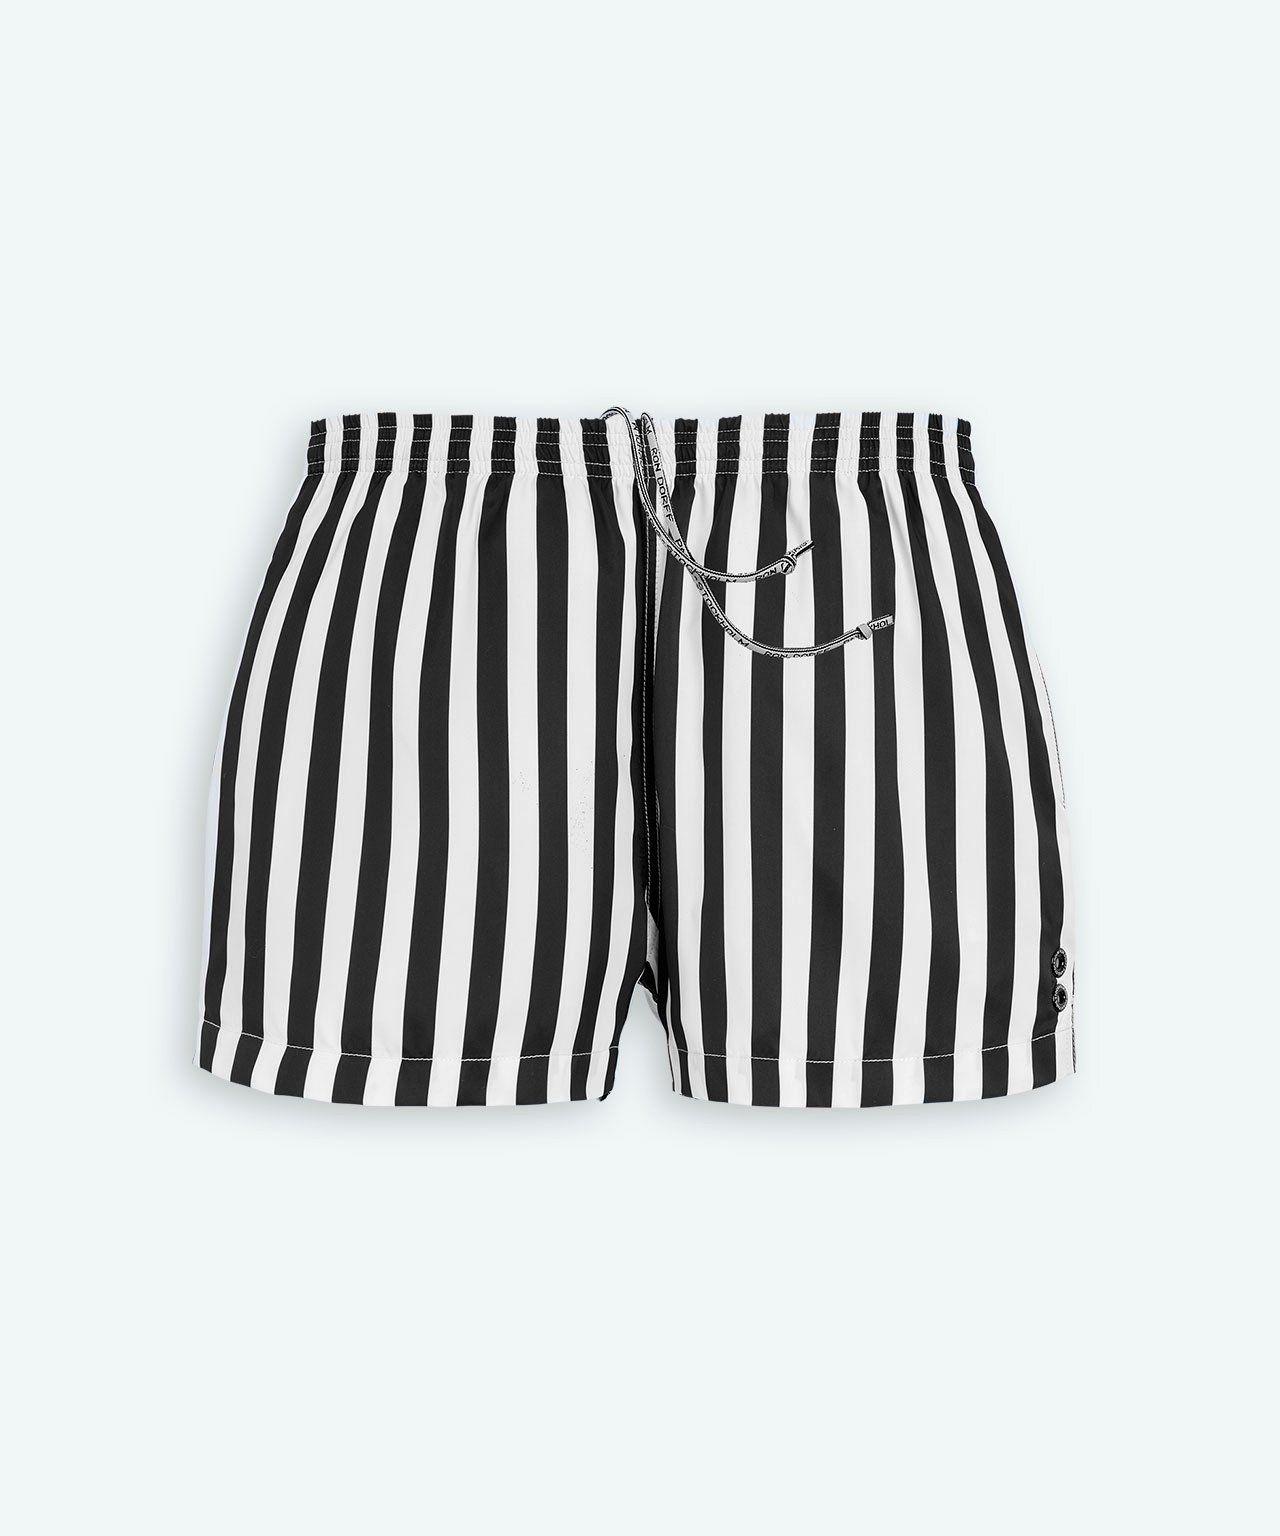 0d56c4a98ee9 Swim Shorts Vertical Stripes | Clothes | Swim shorts, Vertical ...